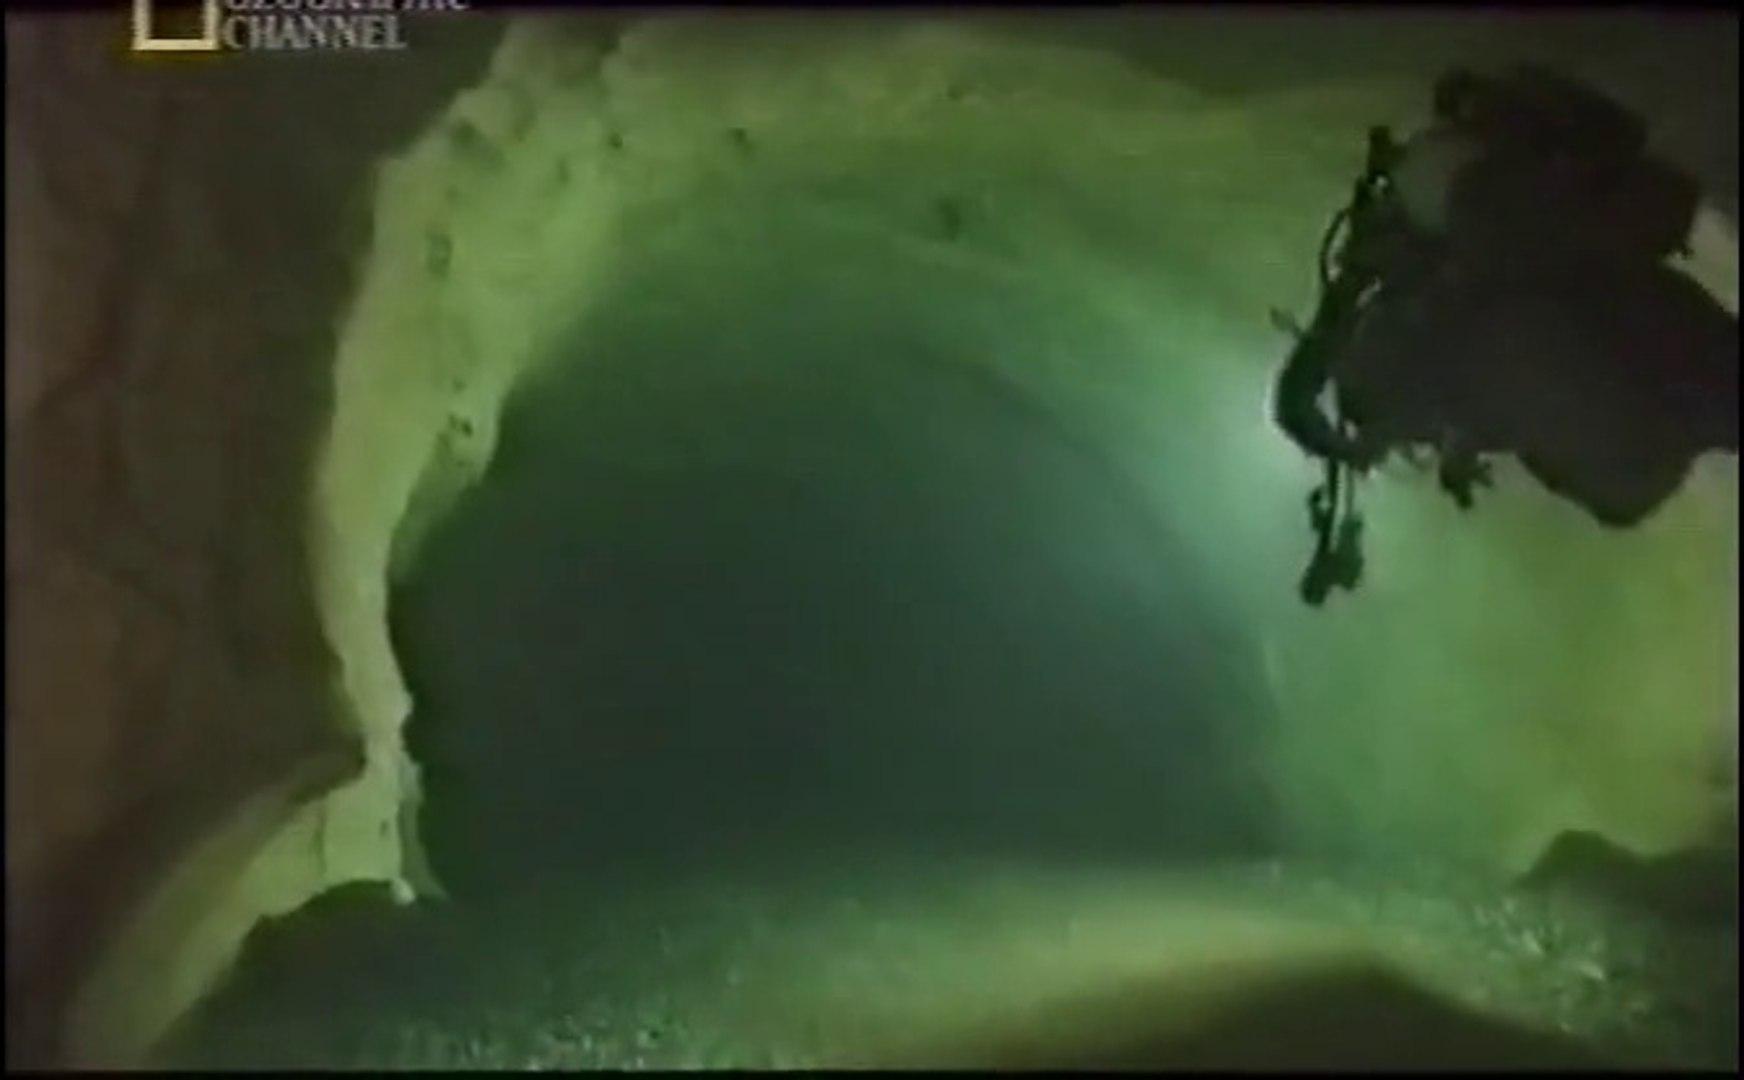 The Secret Underworld (Movile sulphur cave life, Romania) [National  Geographic Adventures]